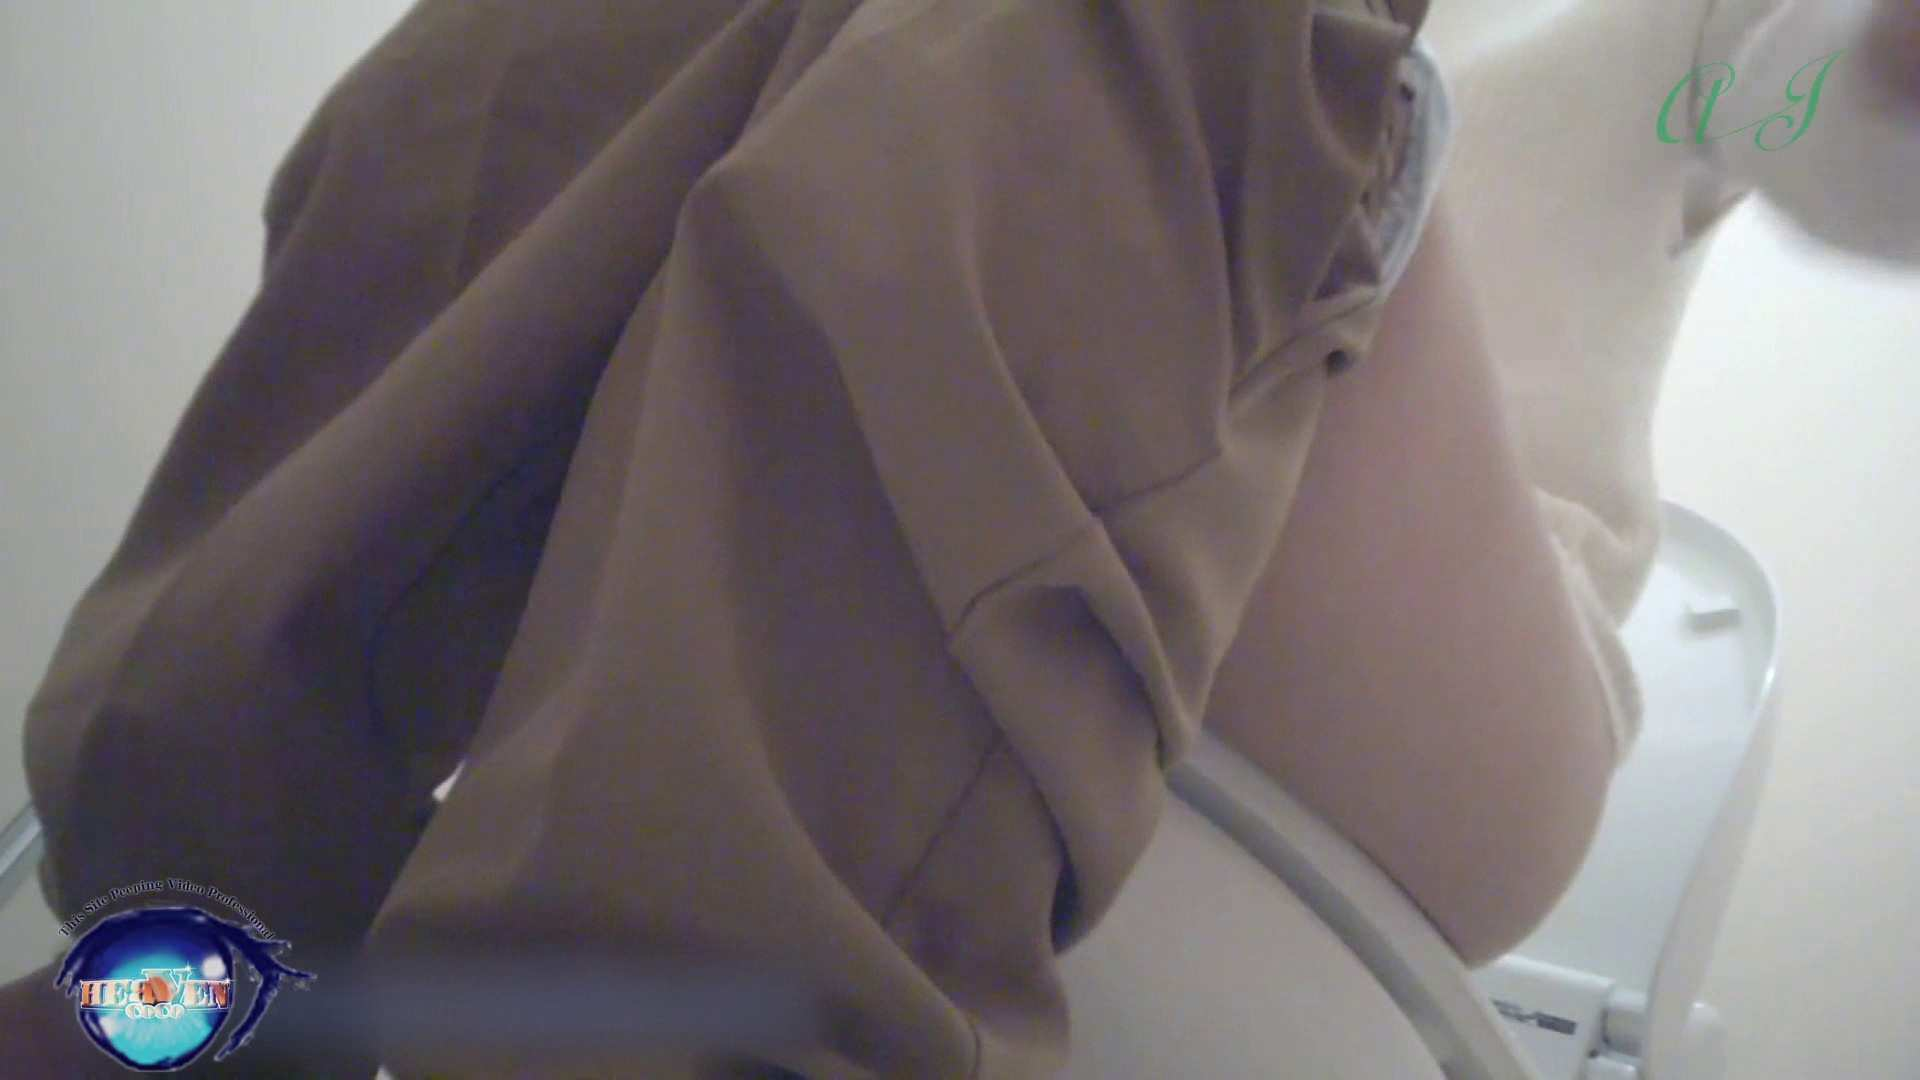 有名大学女性洗面所 vol.71 美女学生さんの潜入盗撮!後編 投稿 スケベ動画紹介 73画像 6